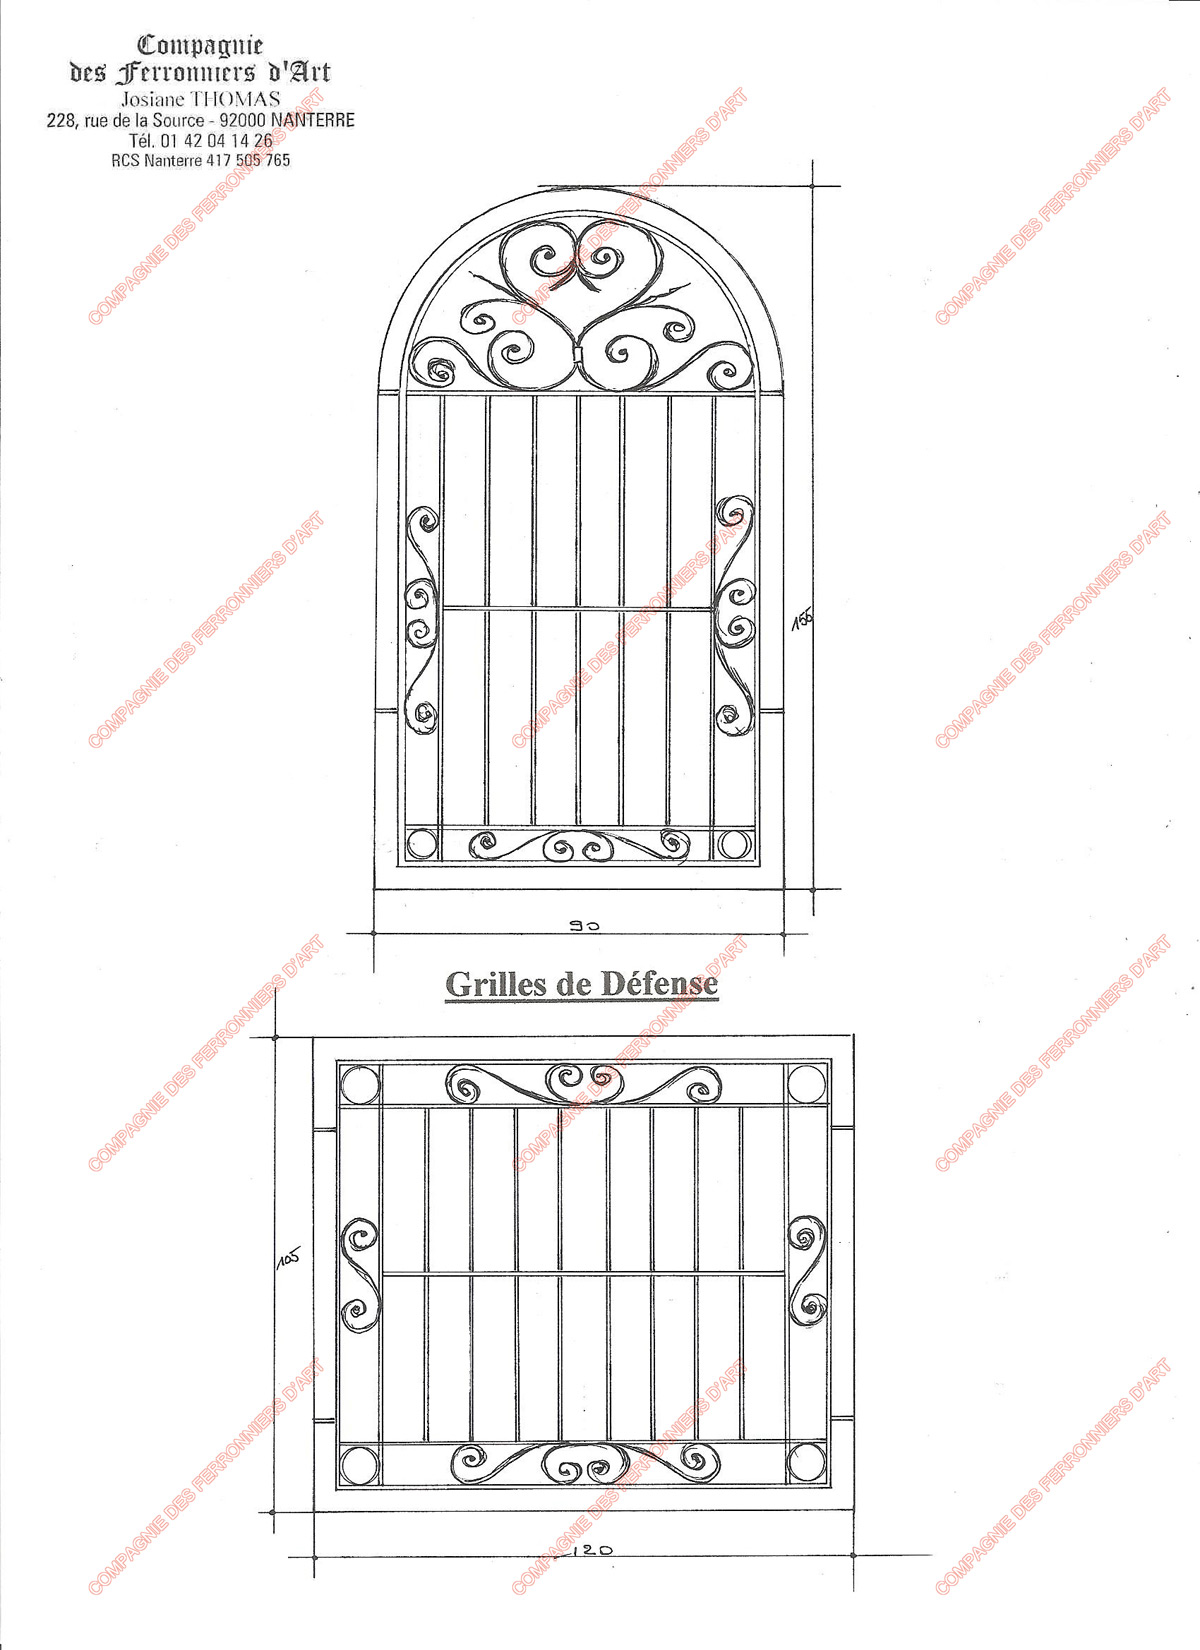 grilles en fer forg de d fense traditionnelles mod le gdt11 barreaux volutes 1. Black Bedroom Furniture Sets. Home Design Ideas